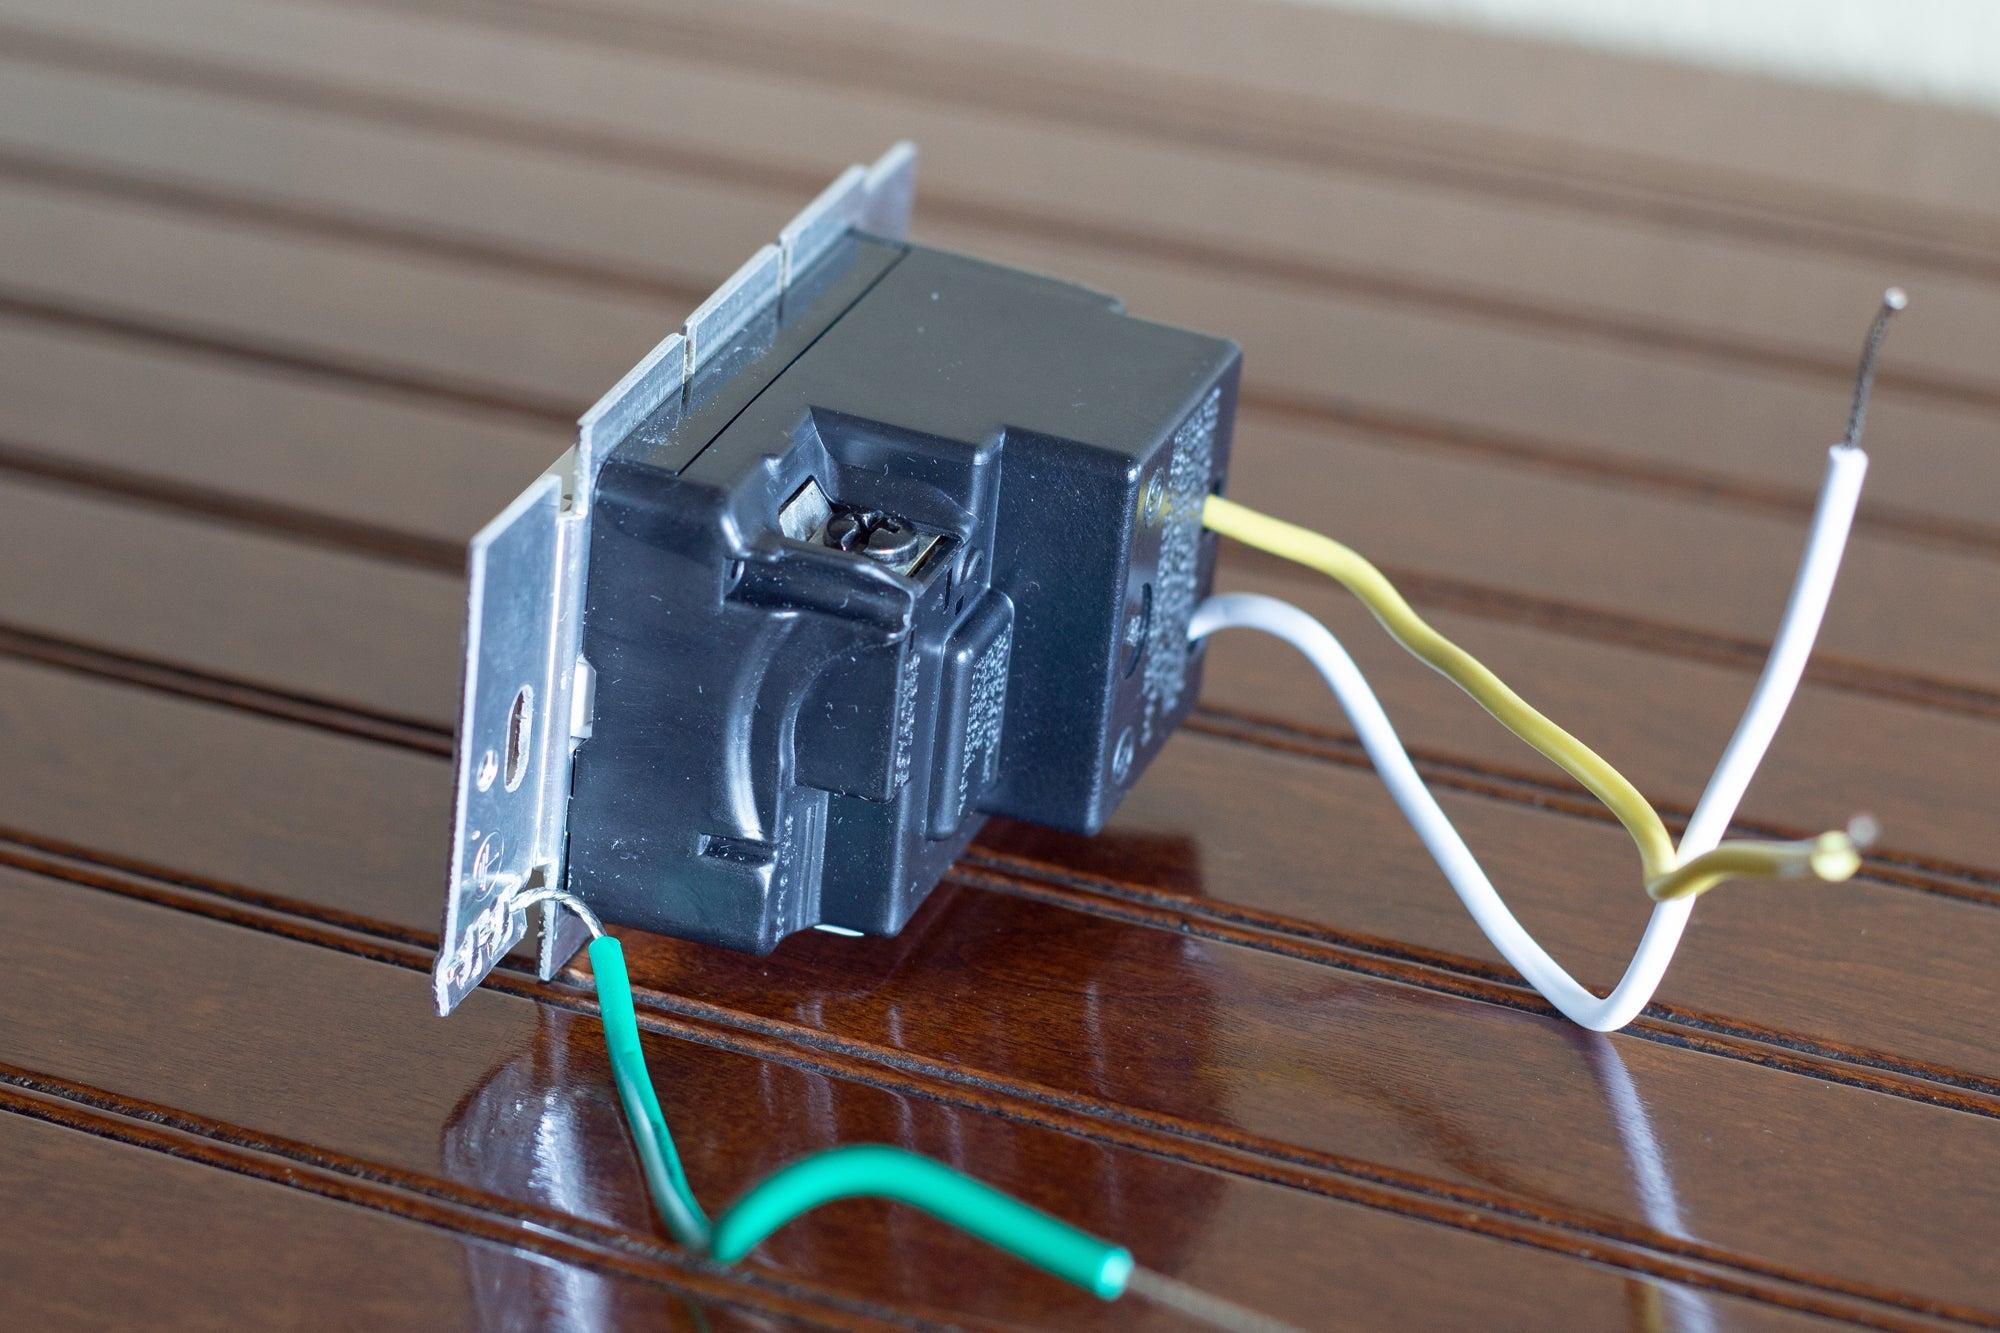 Lutron Cas 233 Ta Fan Control Review Smart Control For Your